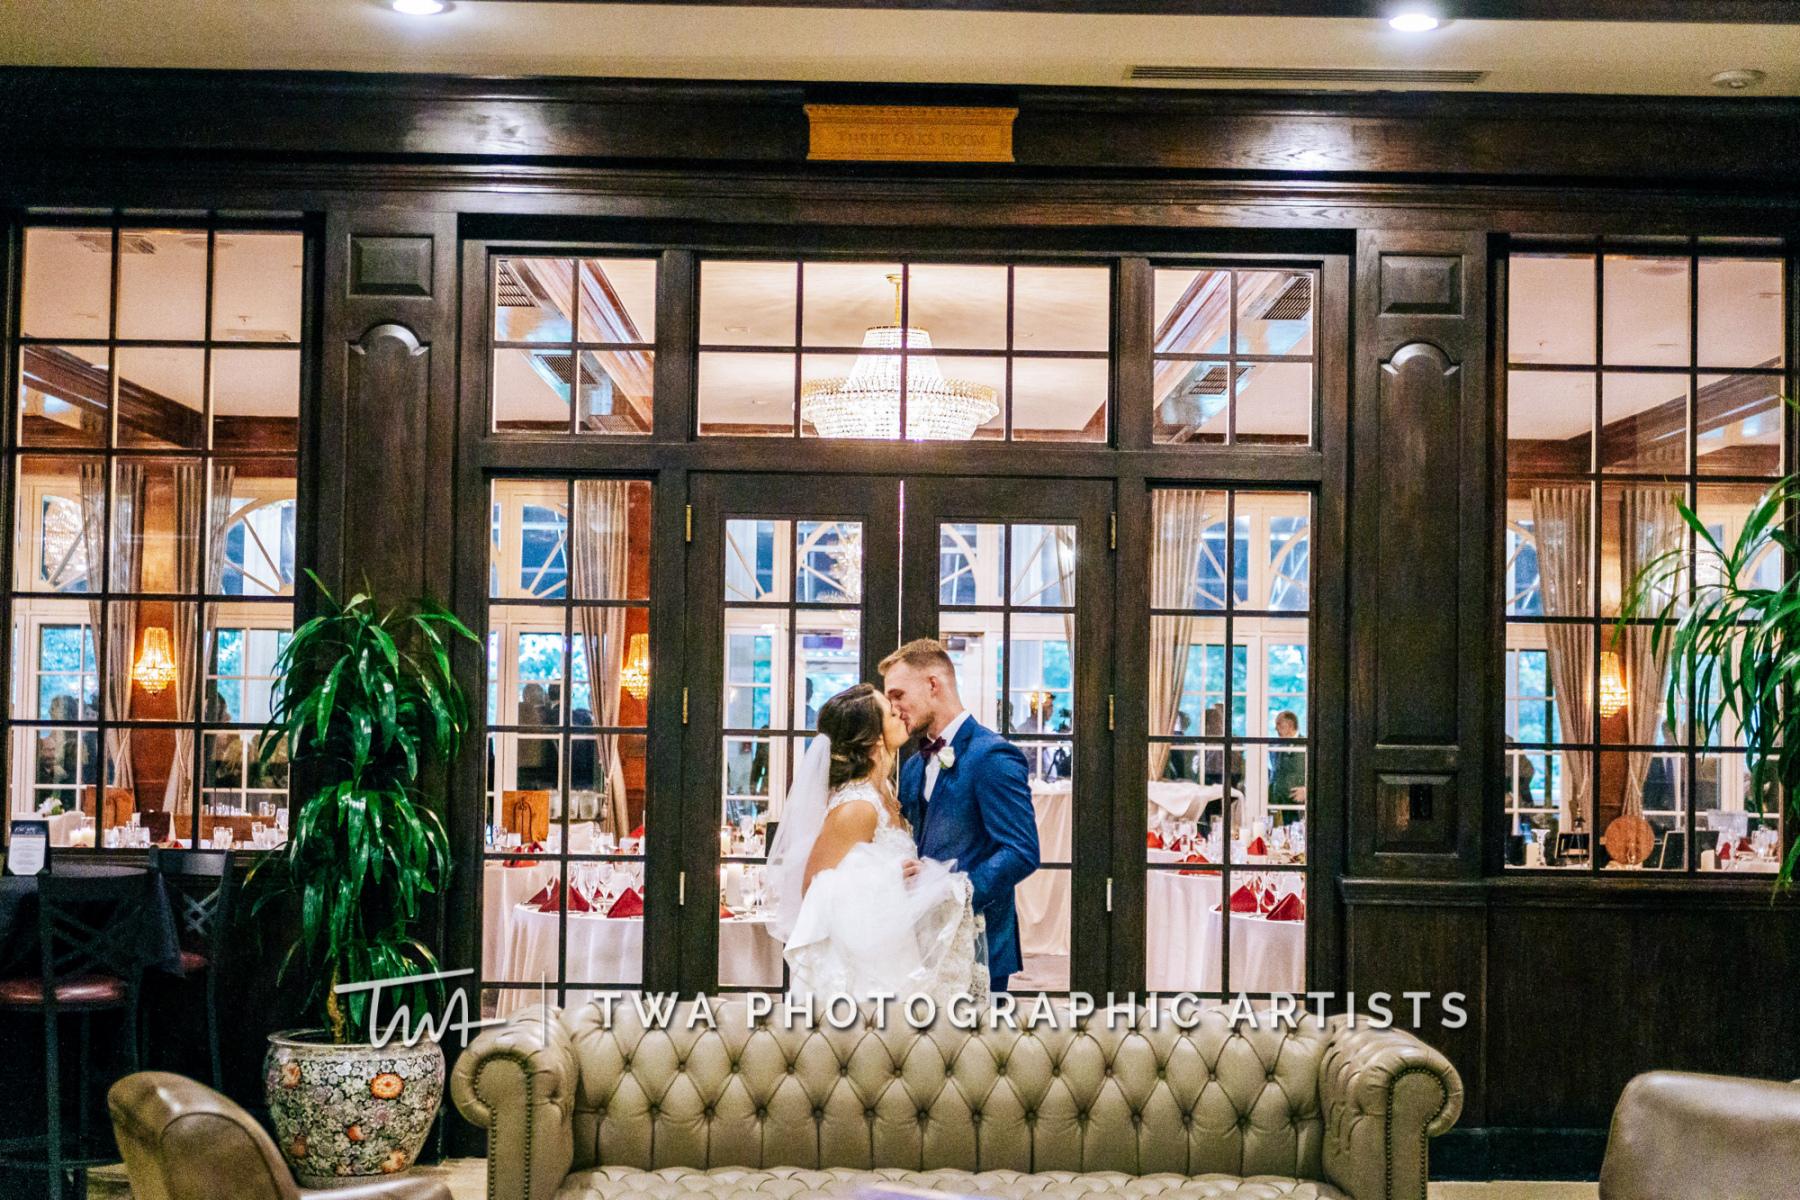 Chicago-Wedding-Photographer-TWA-Photographic-Artists-048_066-1158